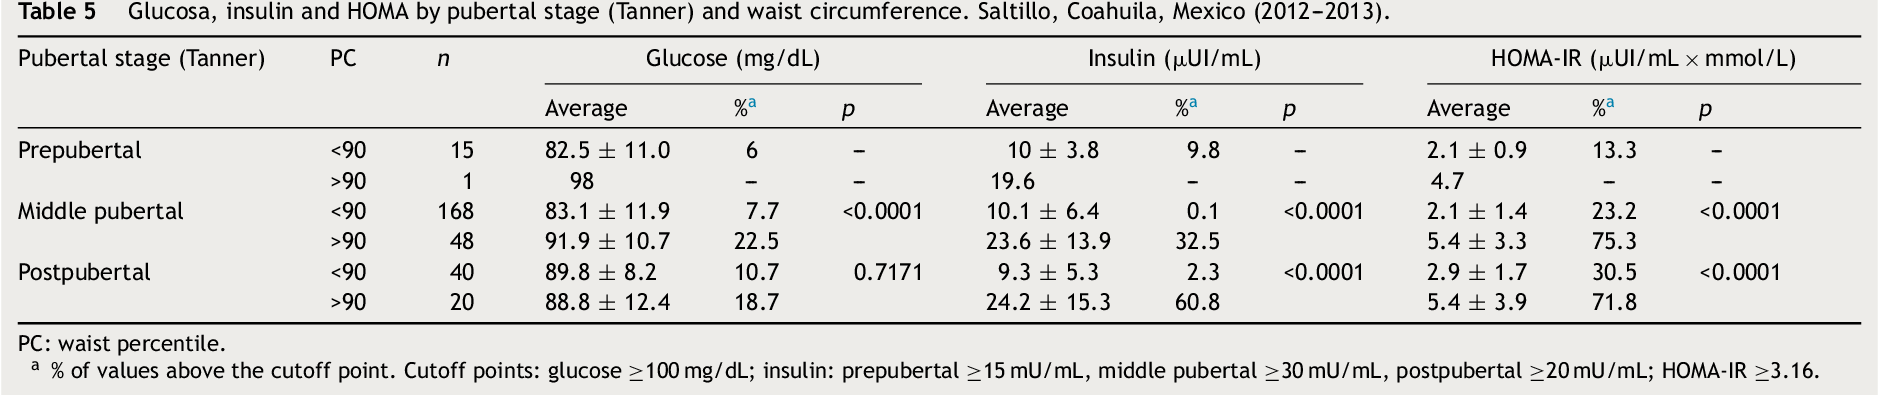 Basal insulina serica